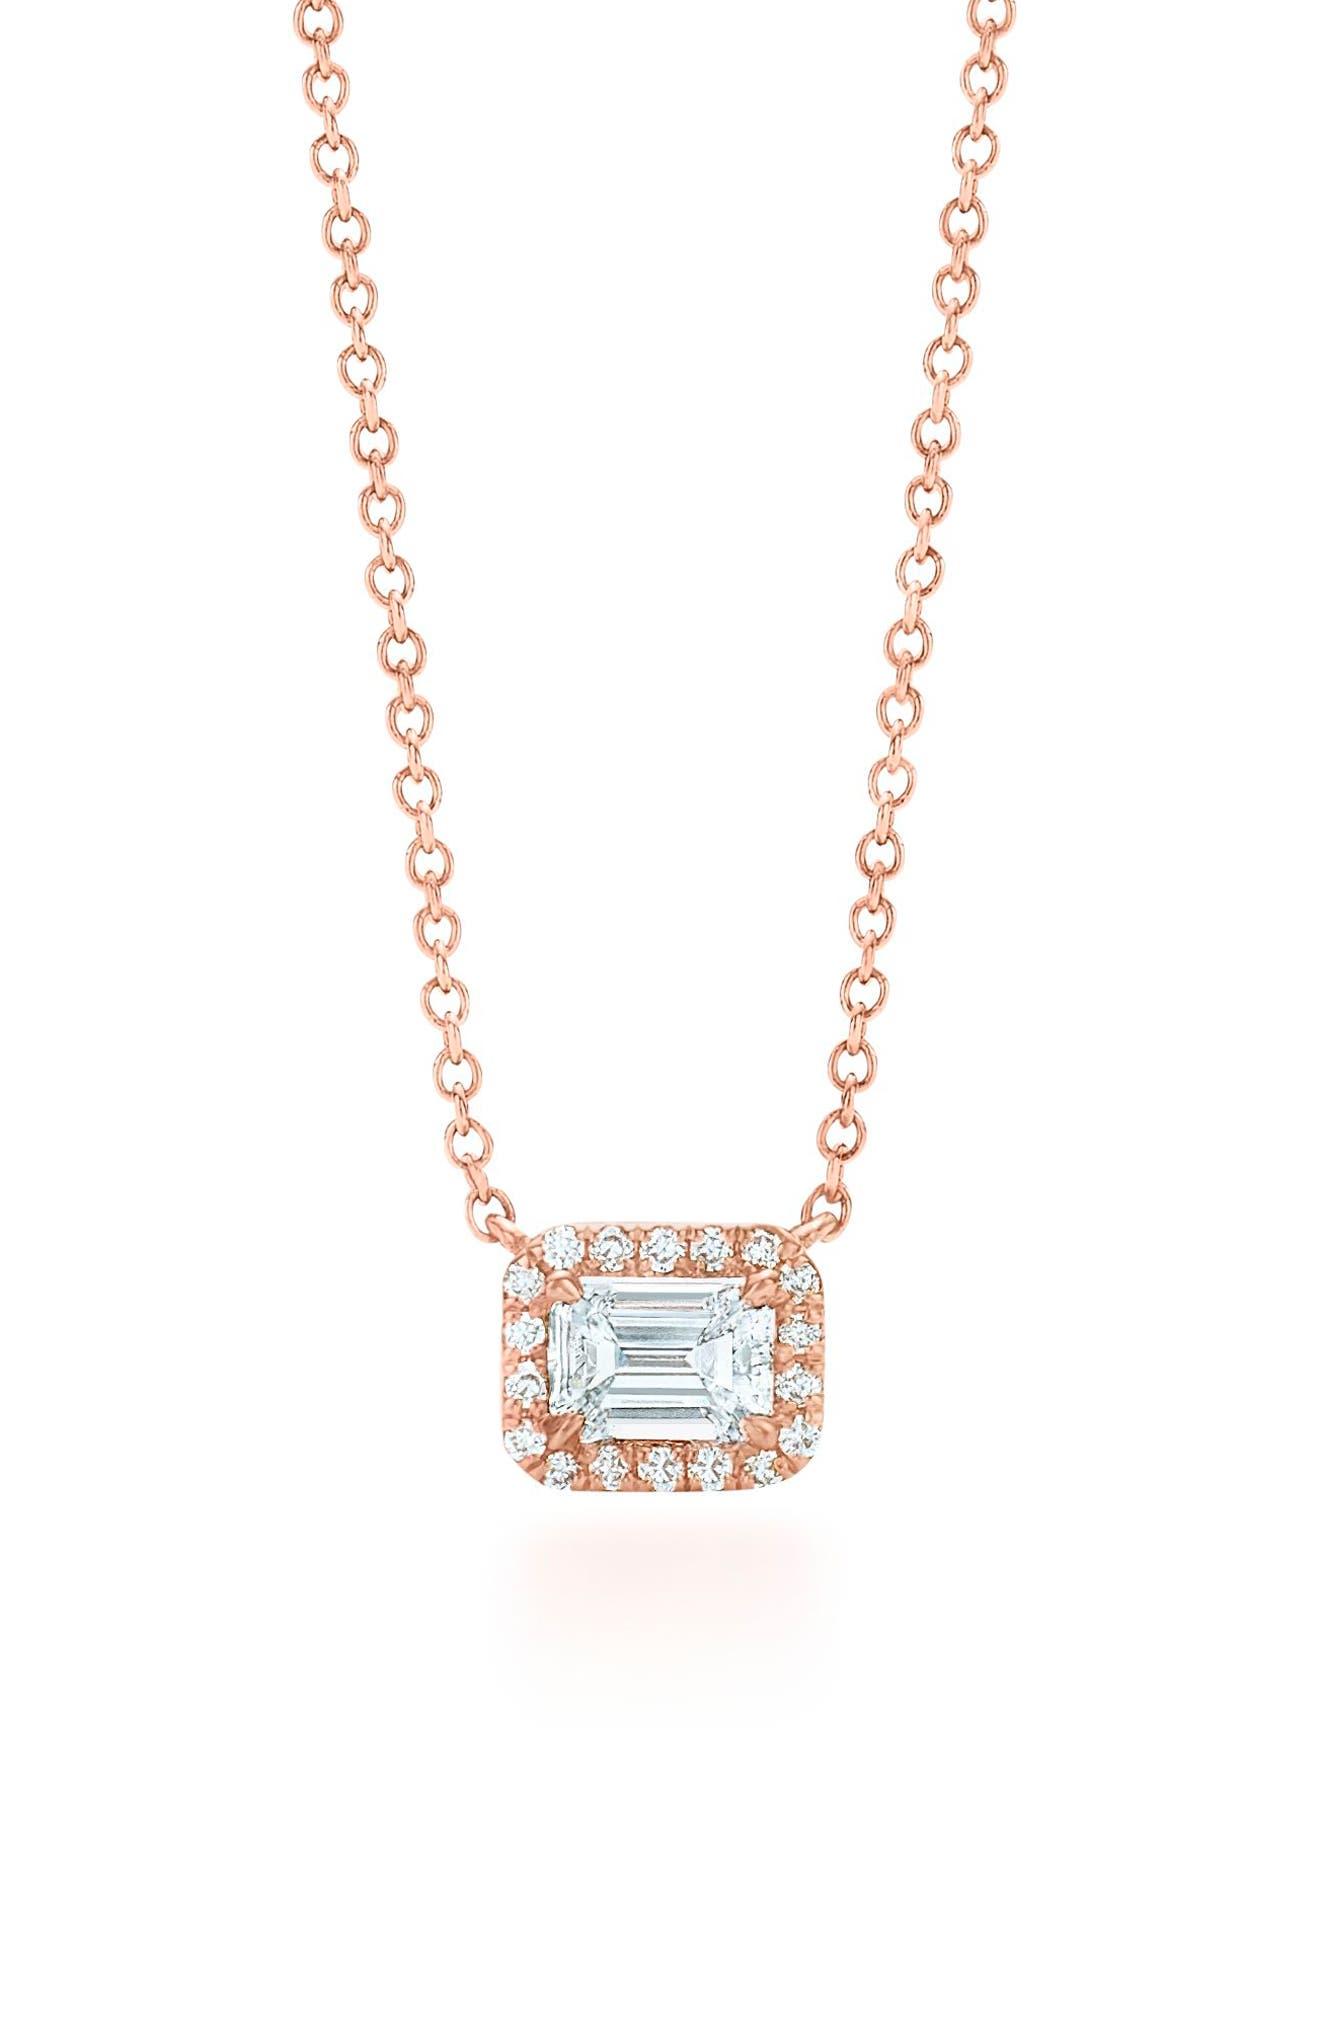 Emerald Cut Diamond Pendant Necklace,                             Main thumbnail 1, color,                             ROSE GOLD